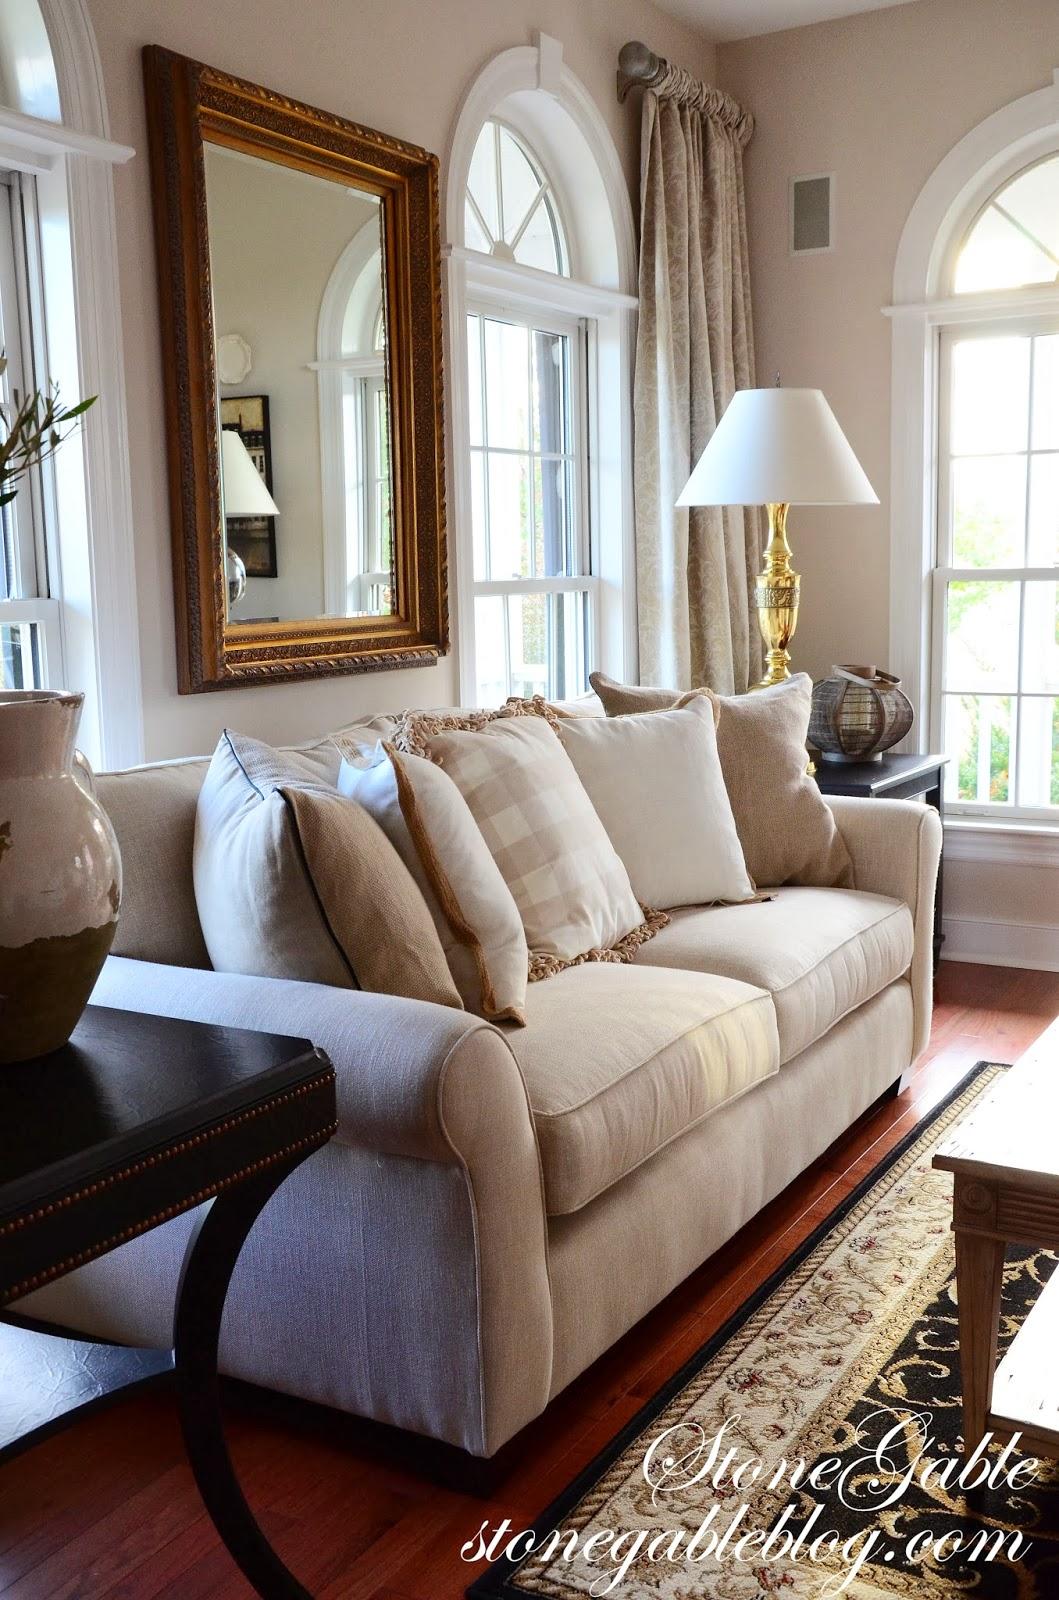 living room curtains stonegable. Black Bedroom Furniture Sets. Home Design Ideas